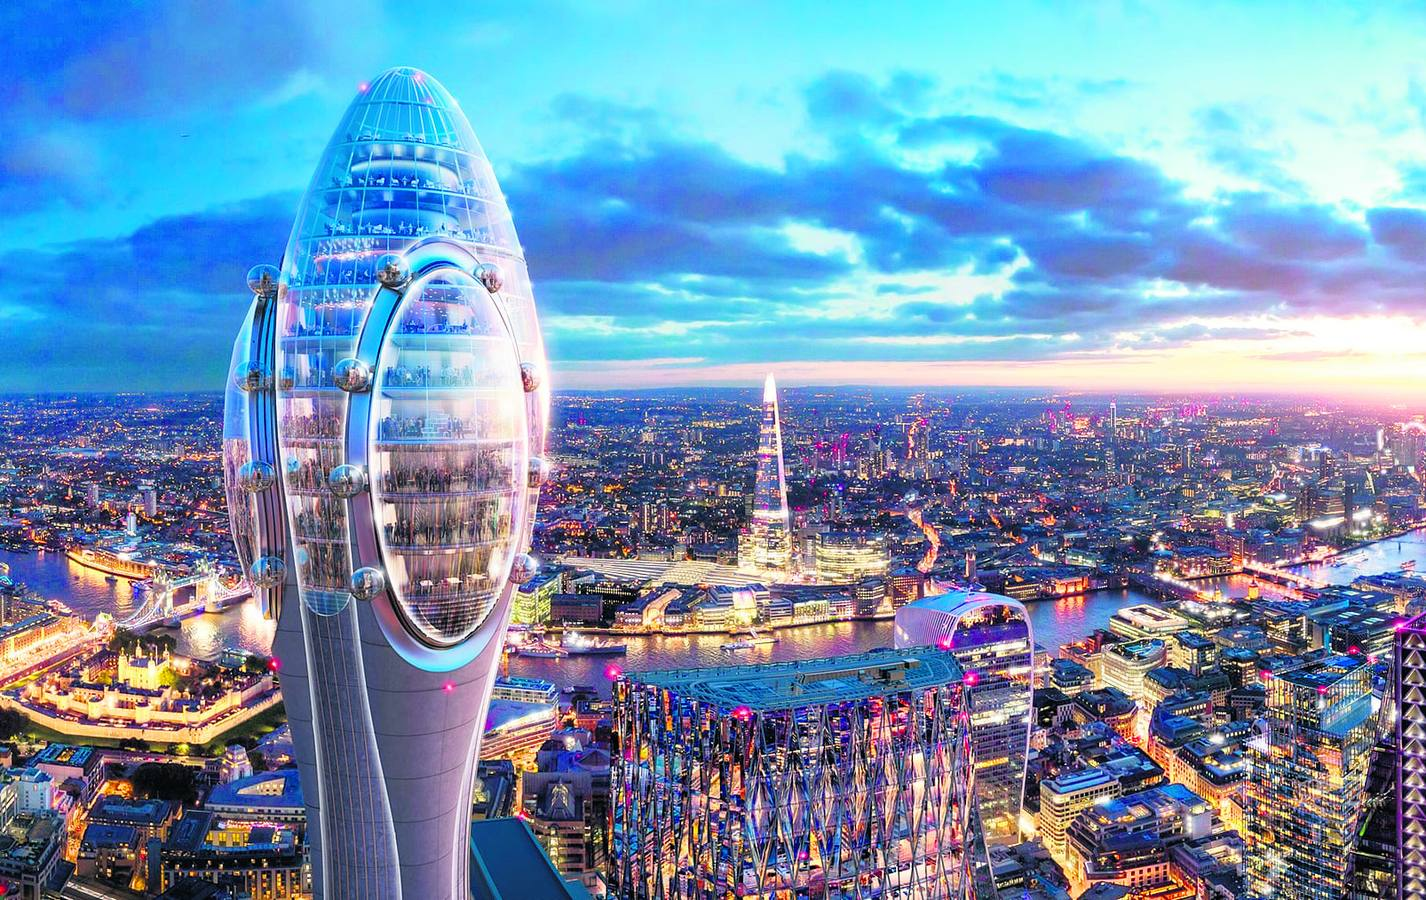 Londres planta un 'Tulipán'